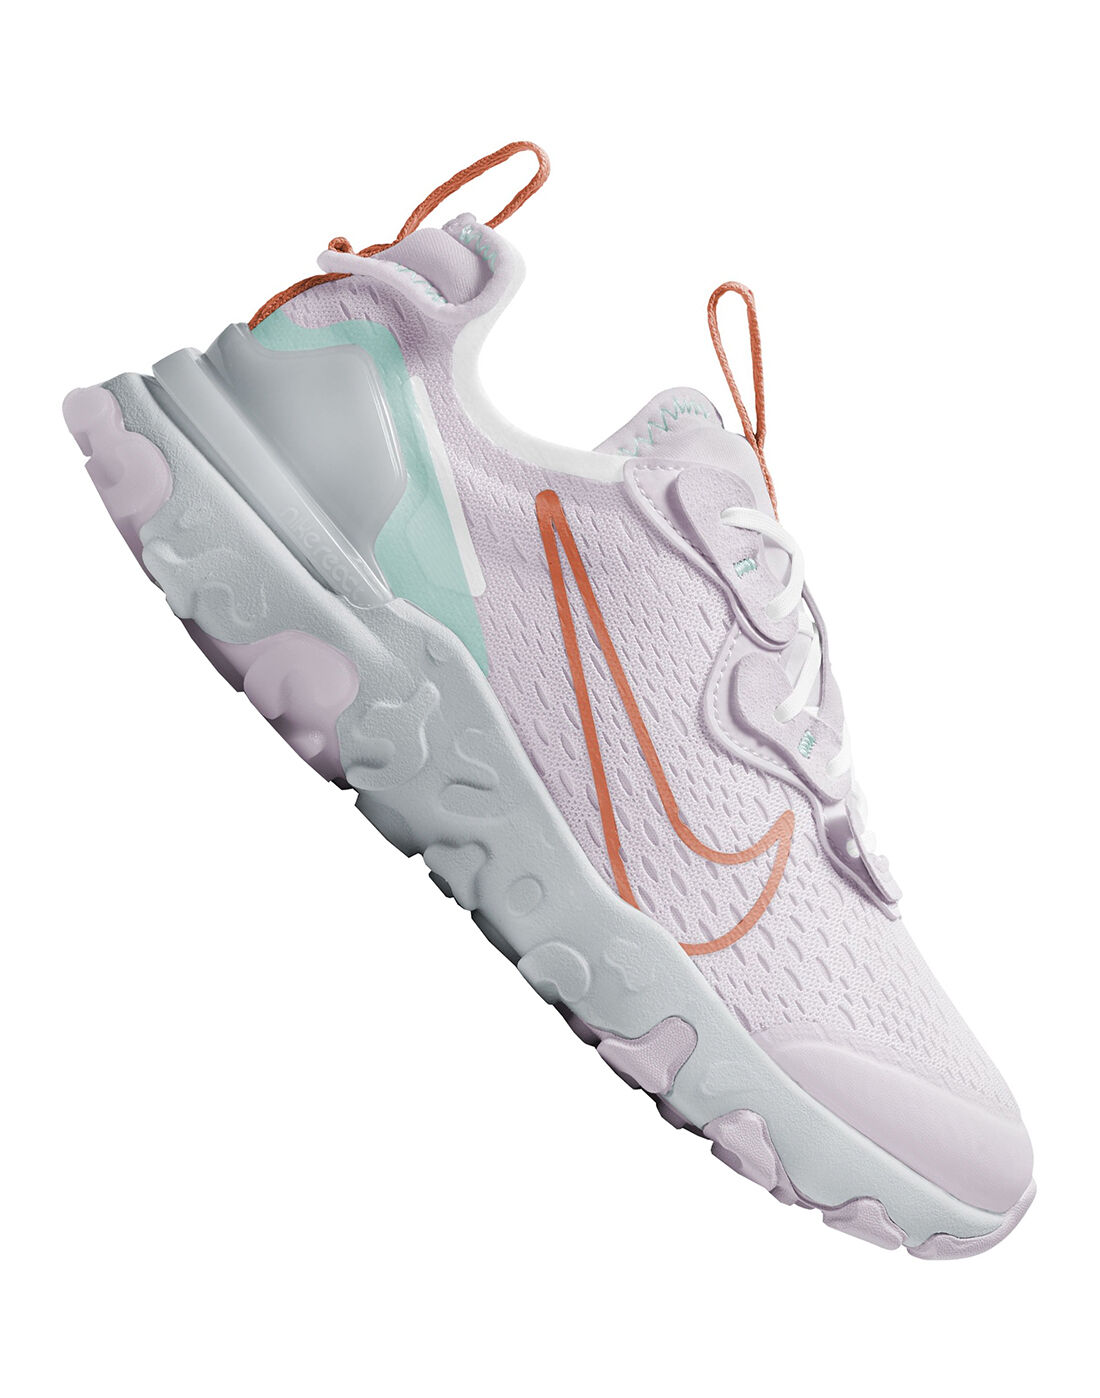 Nike Older Girls React Vision - Purple | nike air max patta lucky ...